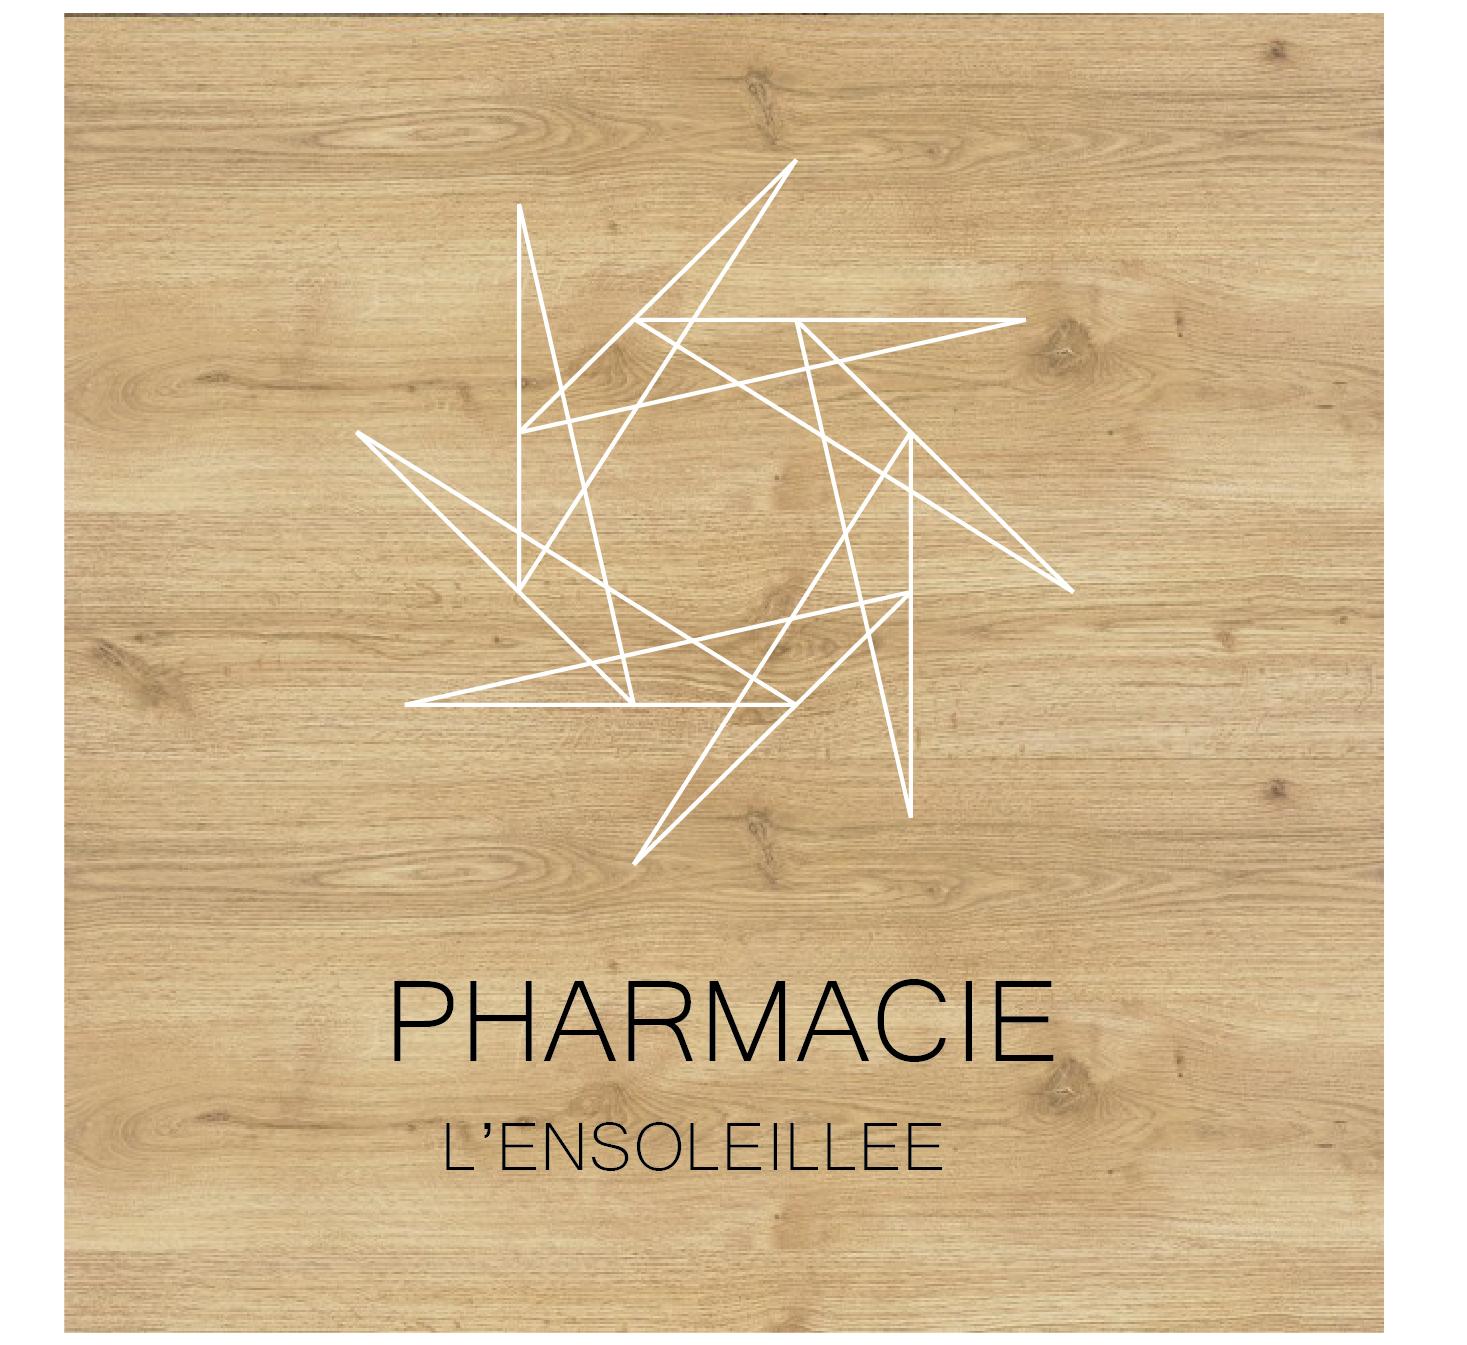 PHARMACIE L'ENSOLEILLEE –  AIX EN PROVENCE (13) 35